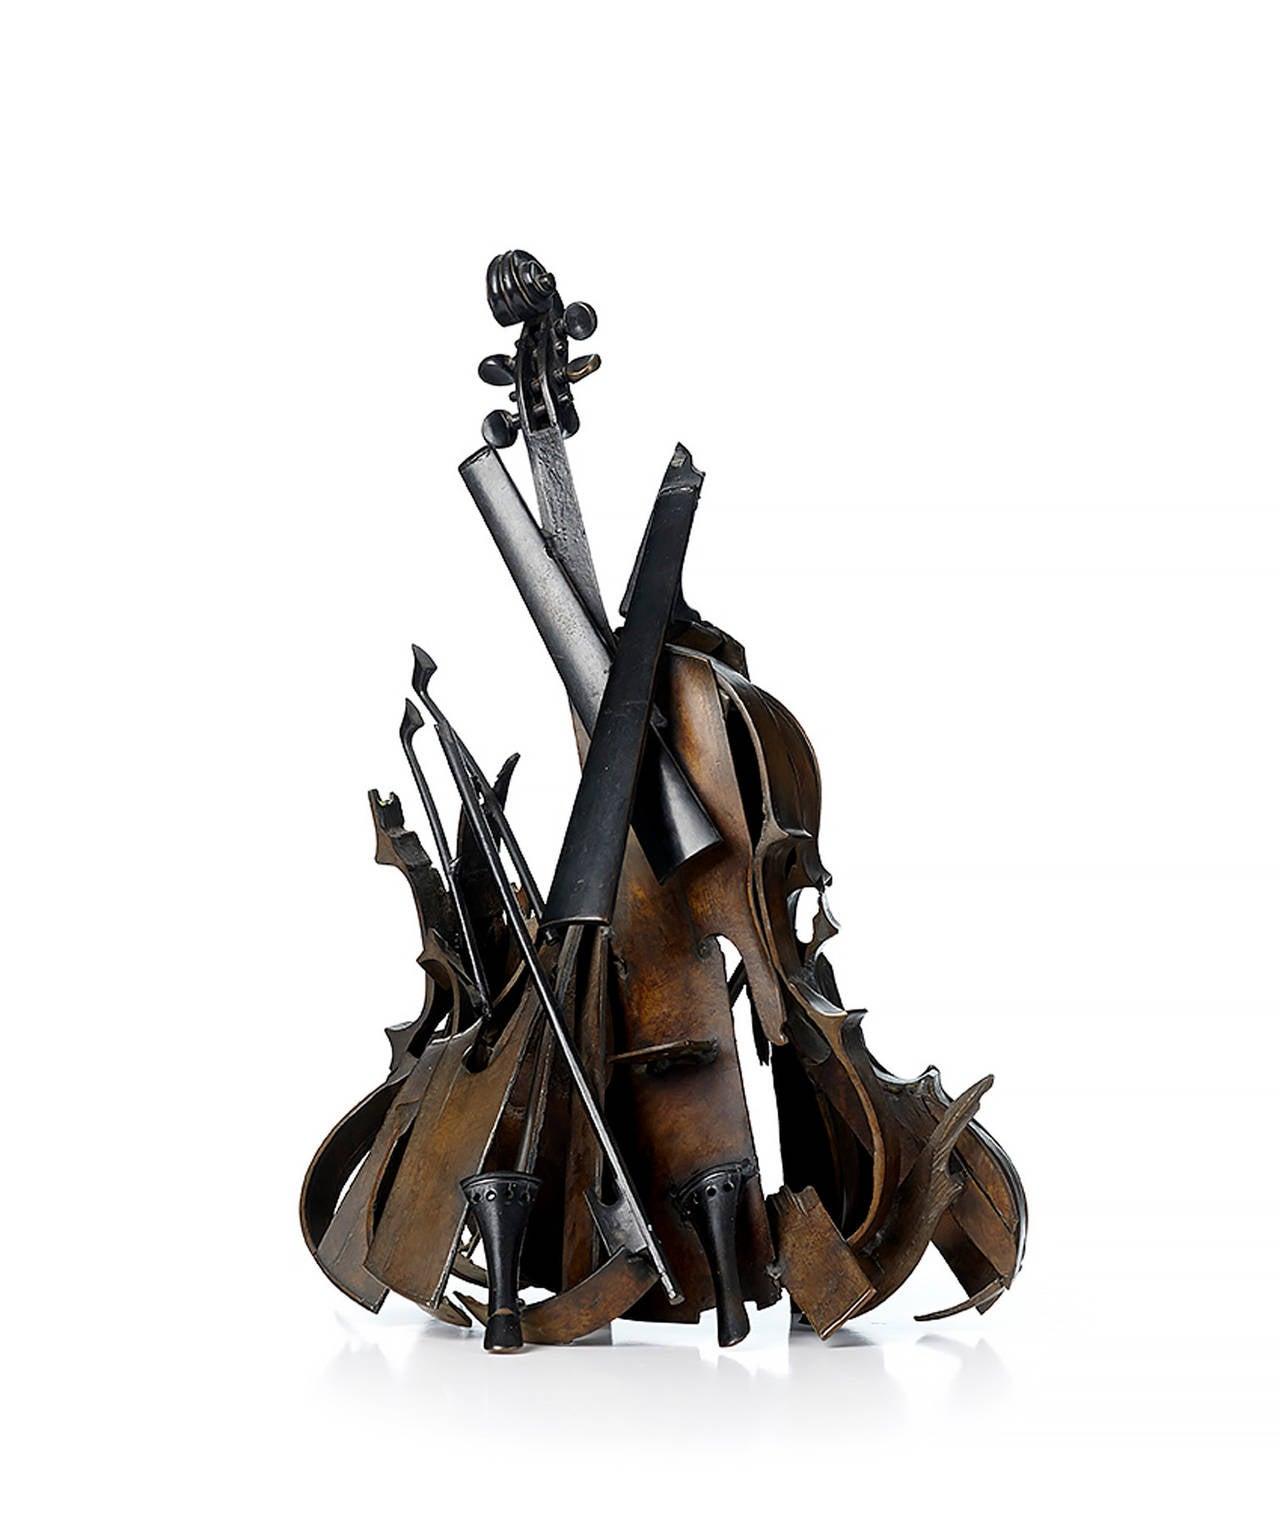 "Fernandez Arman Figurative Sculpture - ""Pyraviole II"" Violons découpes"